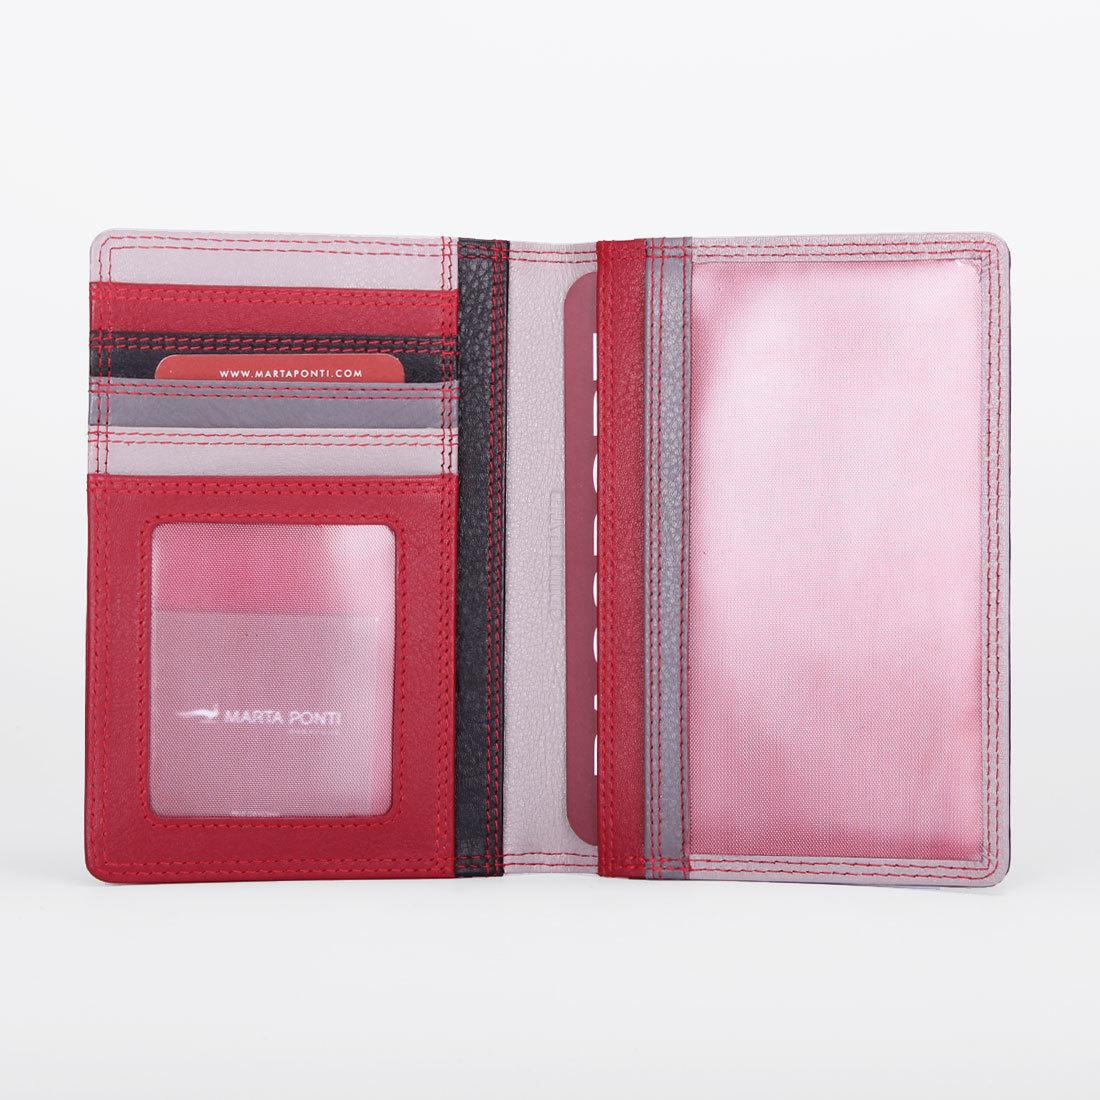 B270047 Hibiscus P - Обложка для паспорта Marta Ponti